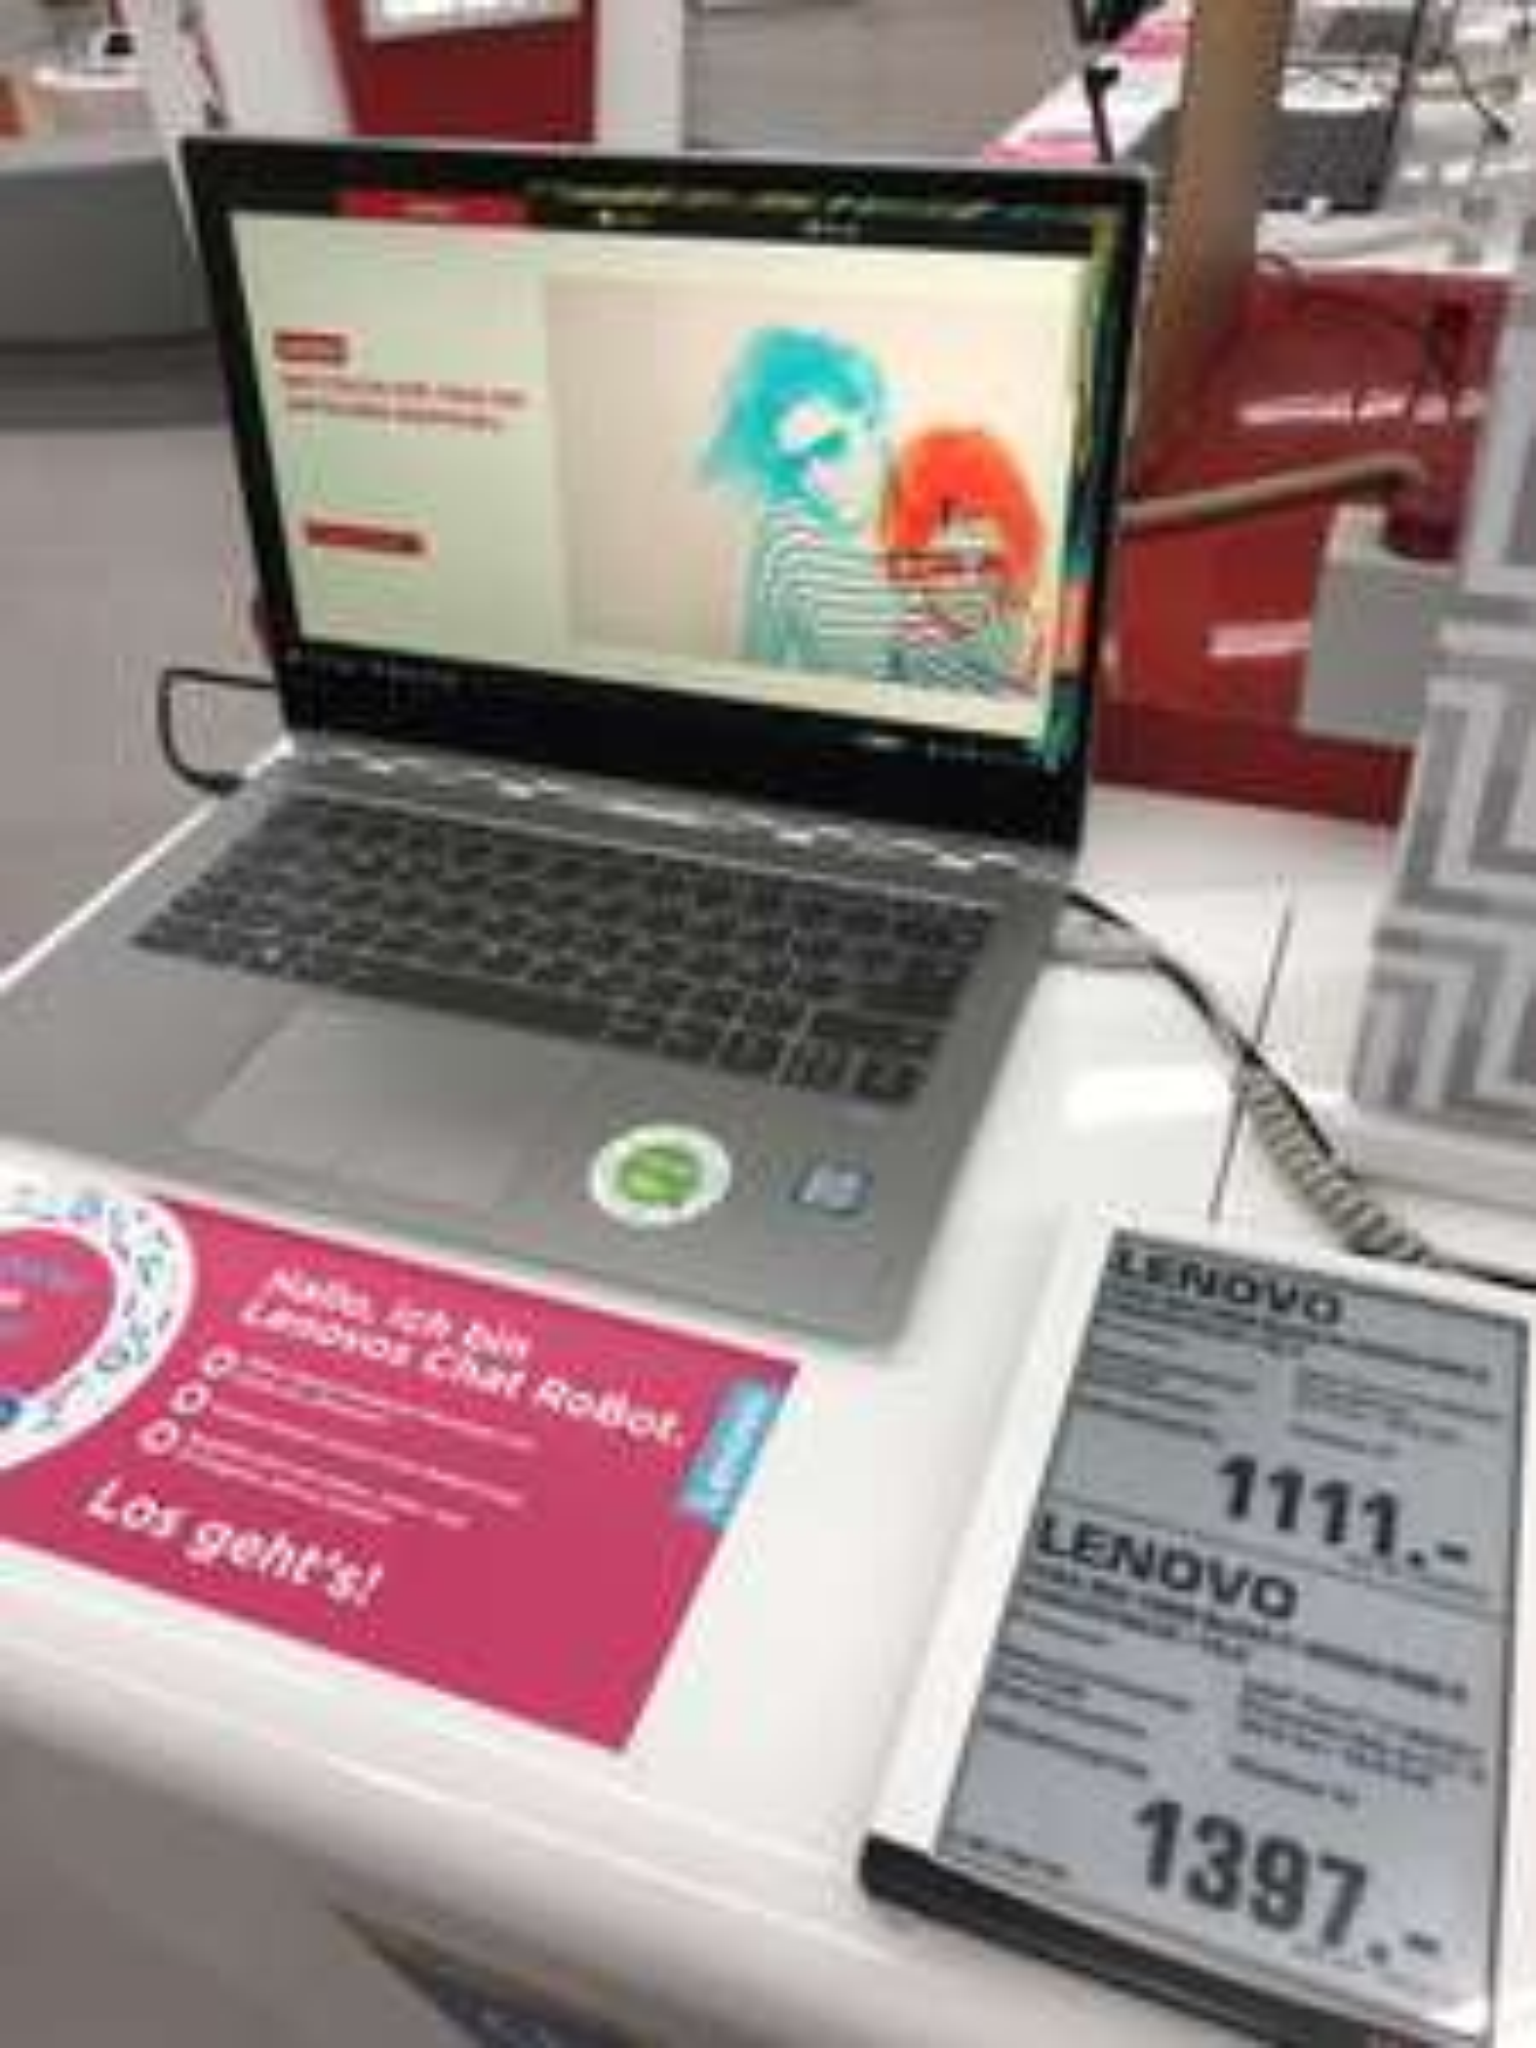 Lokal Saturn Hamburg Sammeldeal Lenovo Angebote Yoga Notebooks und Desktops